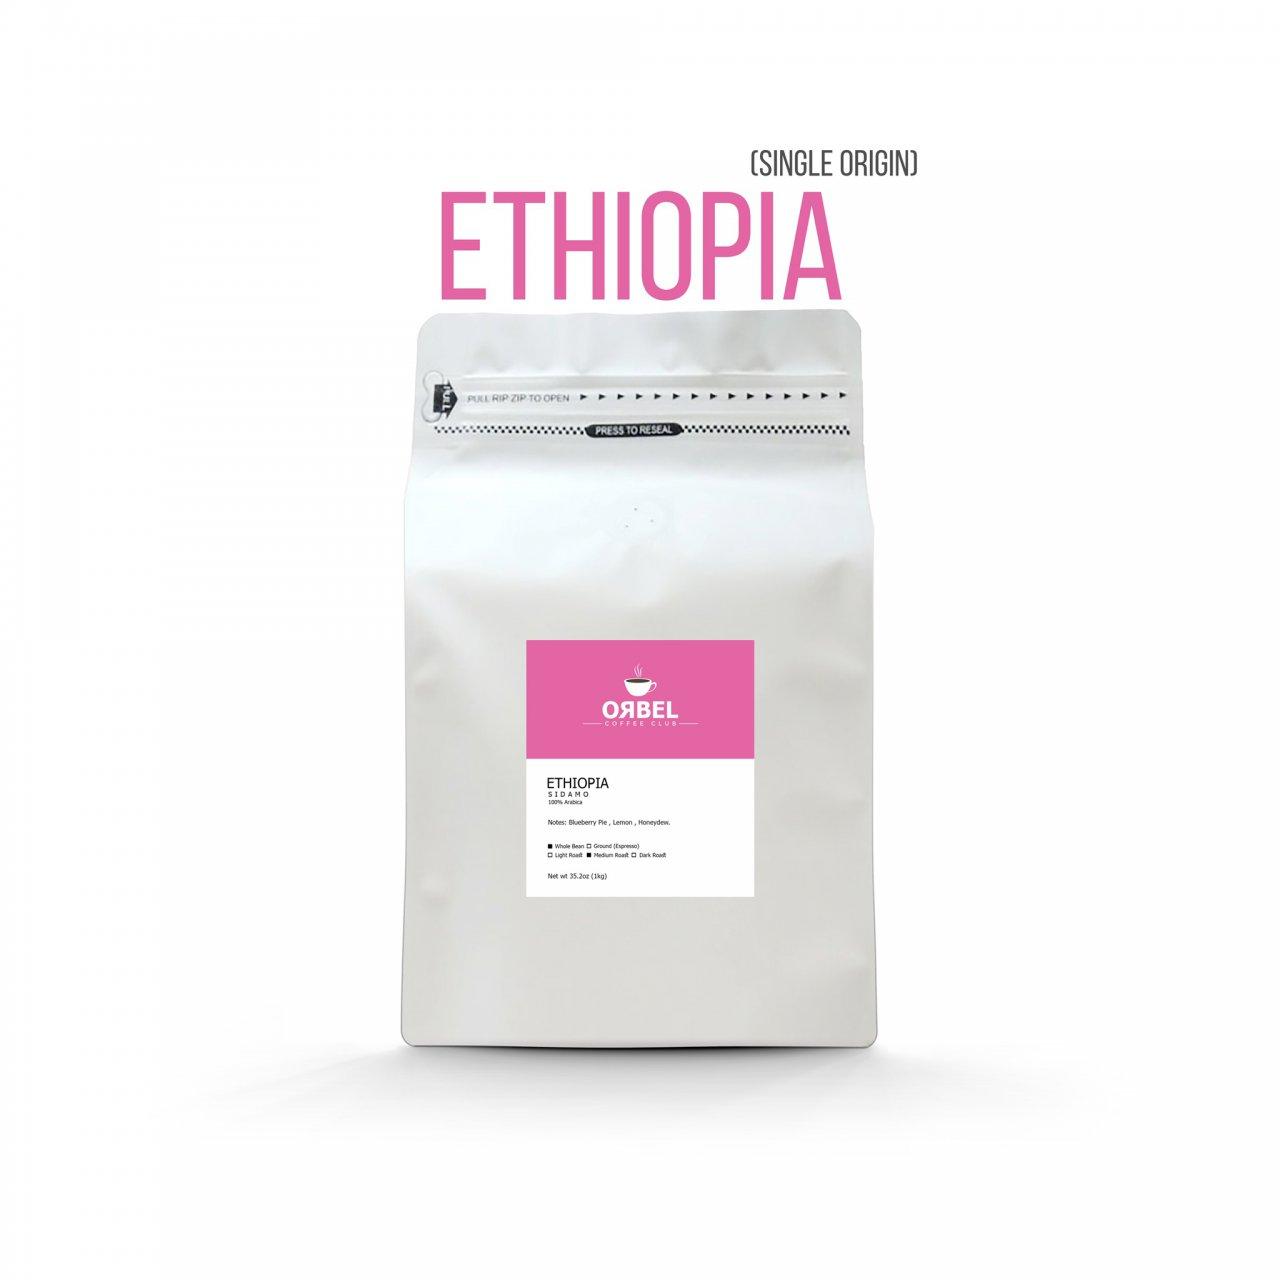 دانه قهوه اتیوپی سیدامو 1 کیلوگرم